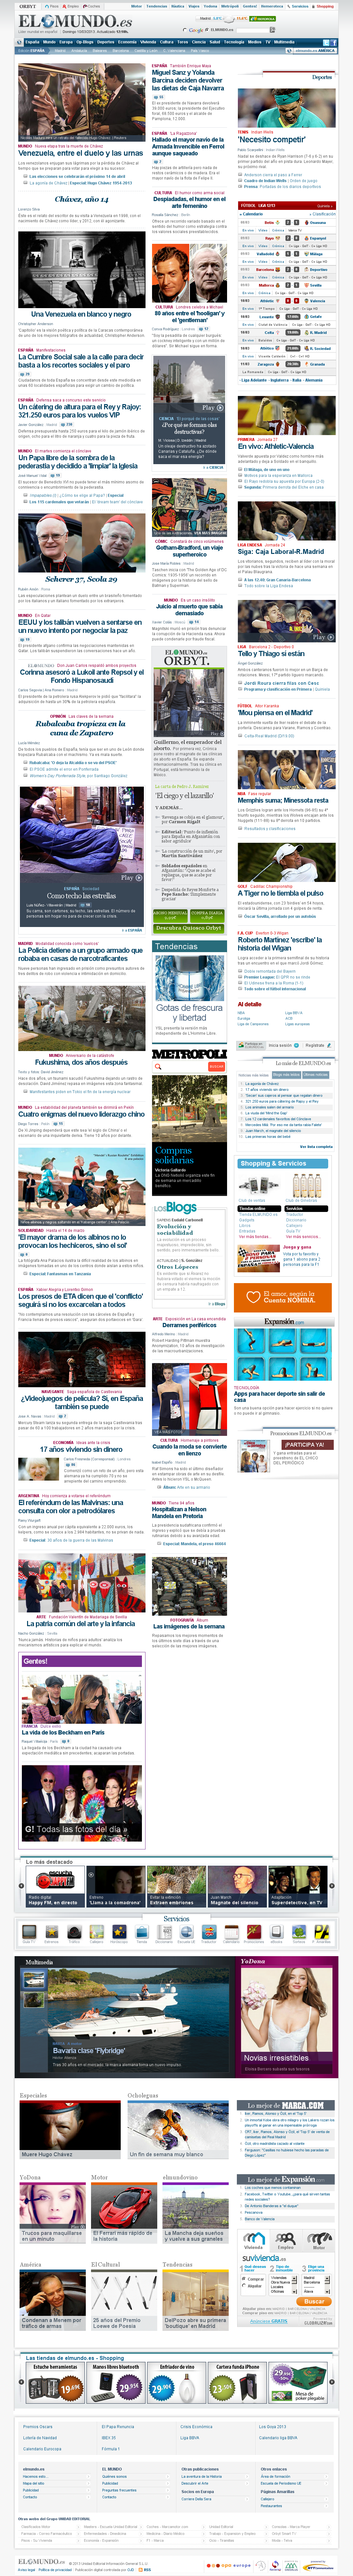 El Mundo at Sunday March 10, 2013, 11:13 a.m. UTC